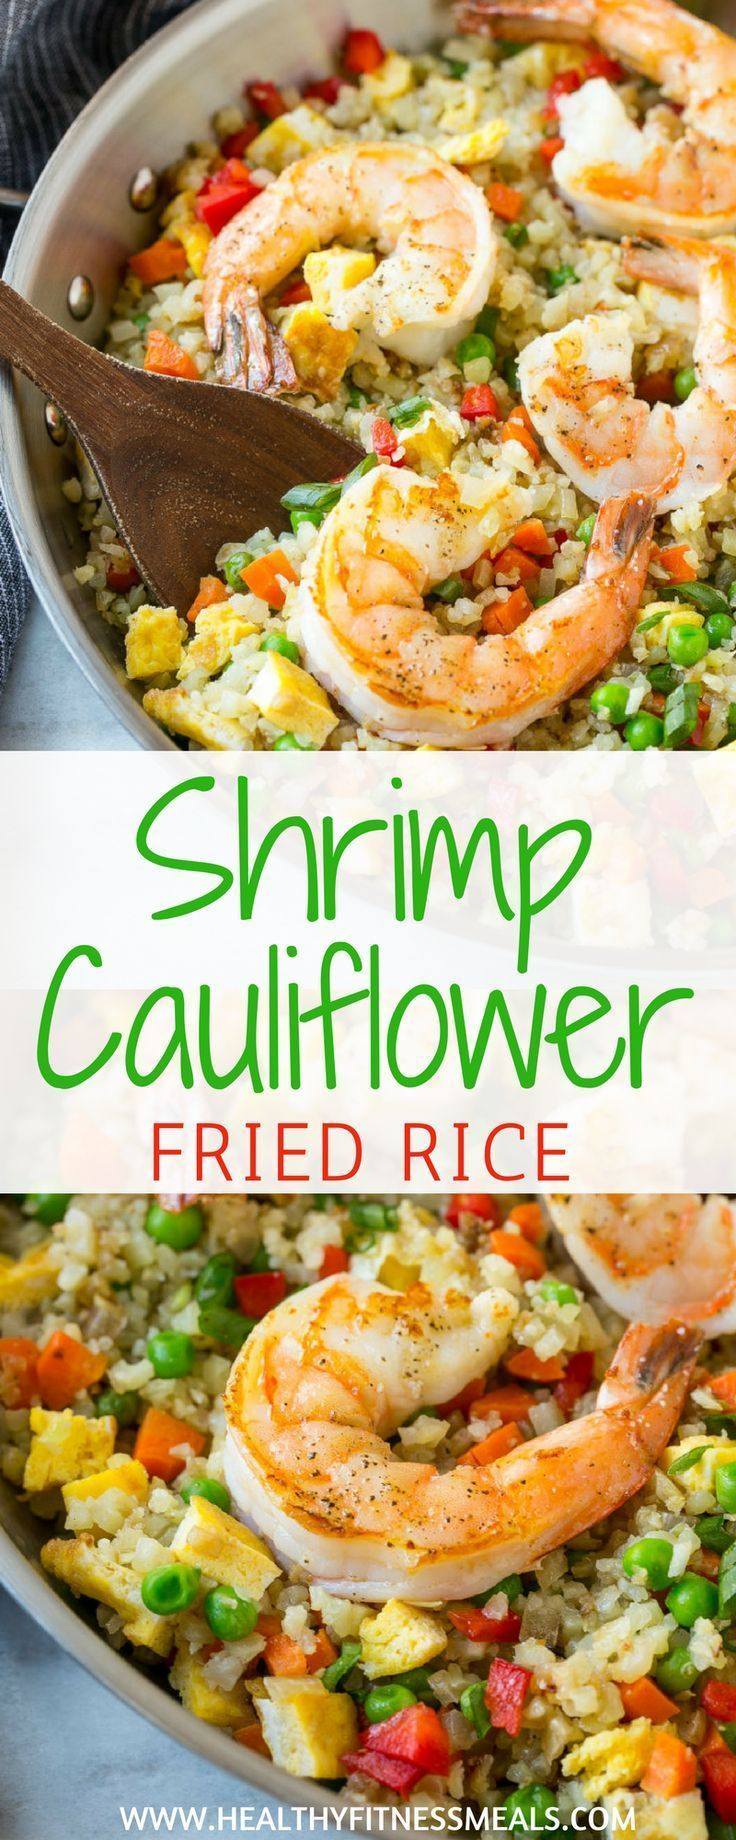 Garnelen Blumenkohl Gebratener Reis | Low Carb | Blumenkohl Gebratener Reis Rezepte | Seaf …   – Healthy Lunch Recipes